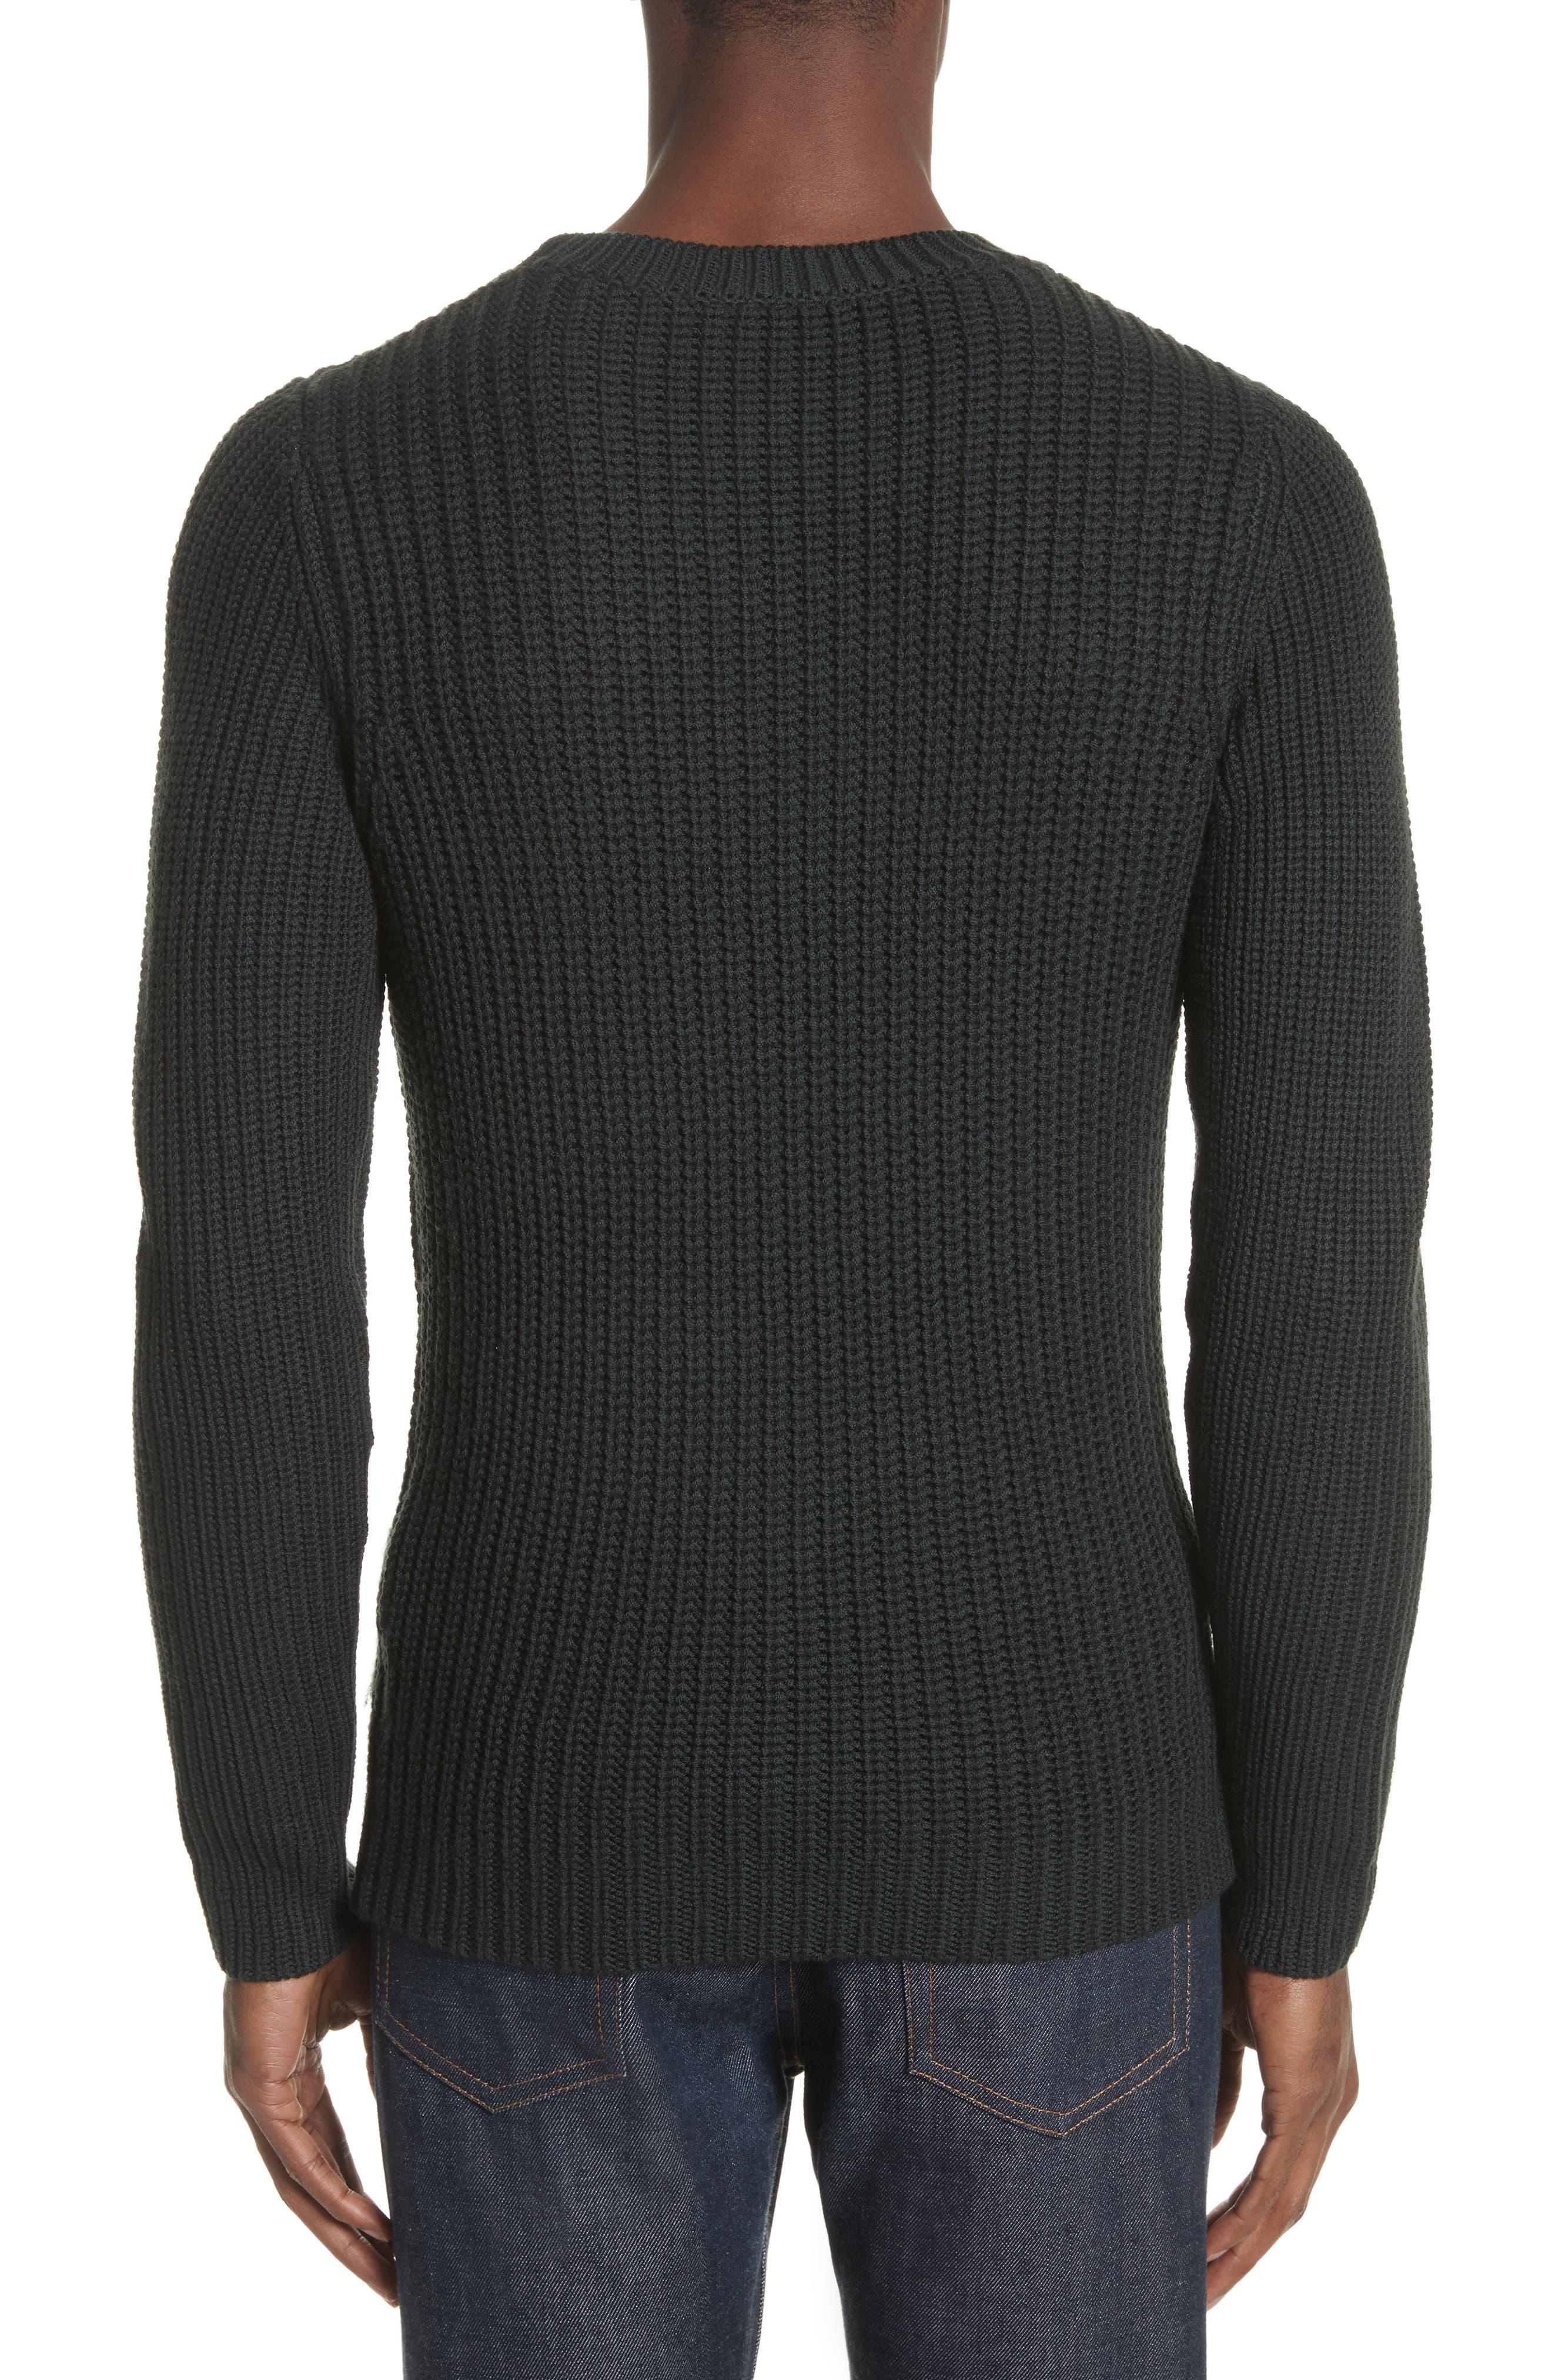 Pull Berger Merino Wool Sweater,                             Alternate thumbnail 2, color,                             Khaki Green